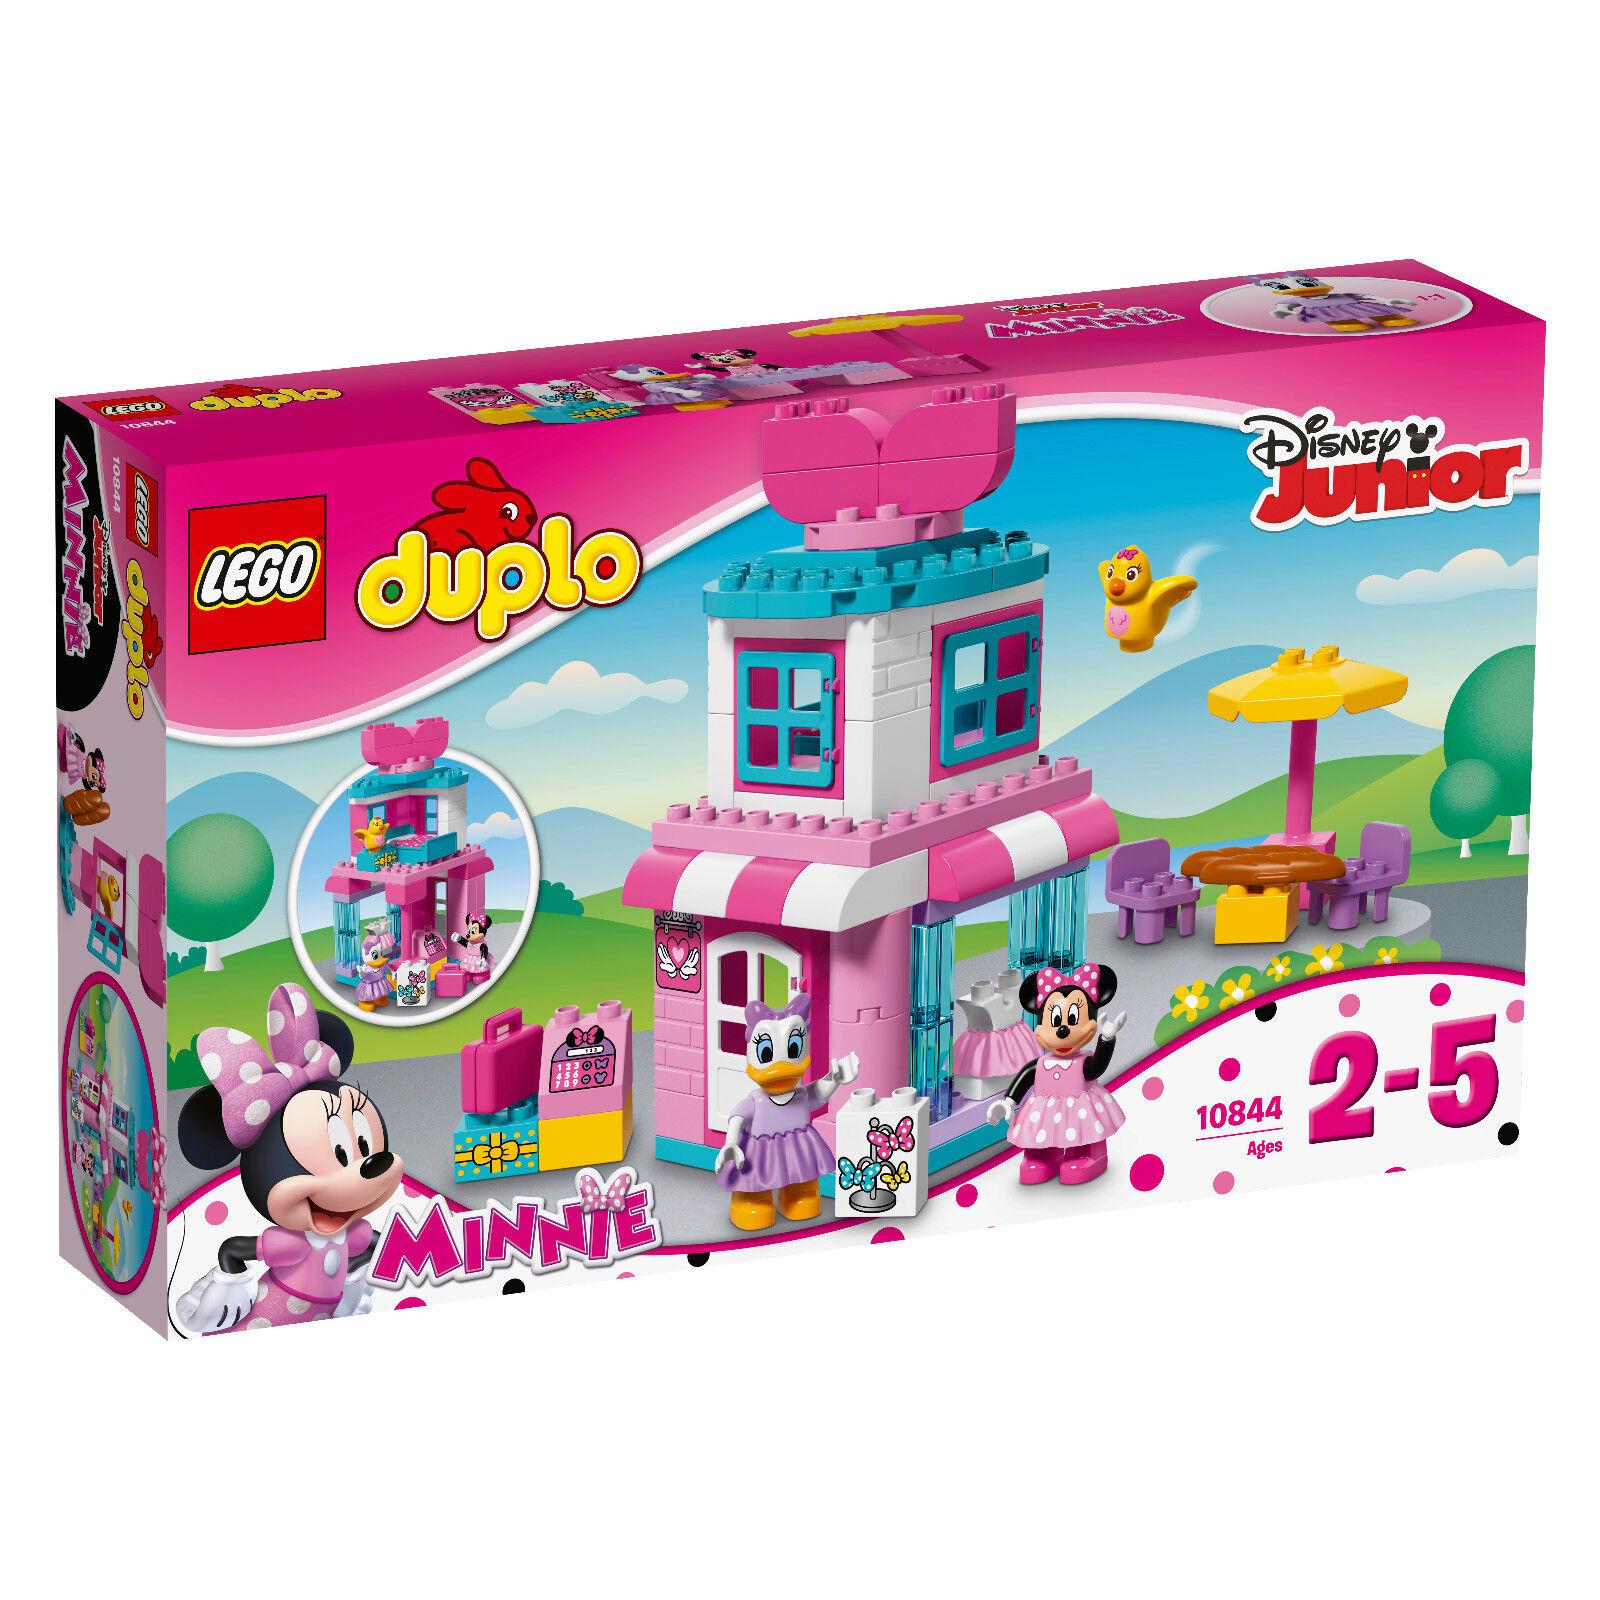 LEGO® Duplo® (10844) Minnies Boutique inkl Versand NEU&OVP